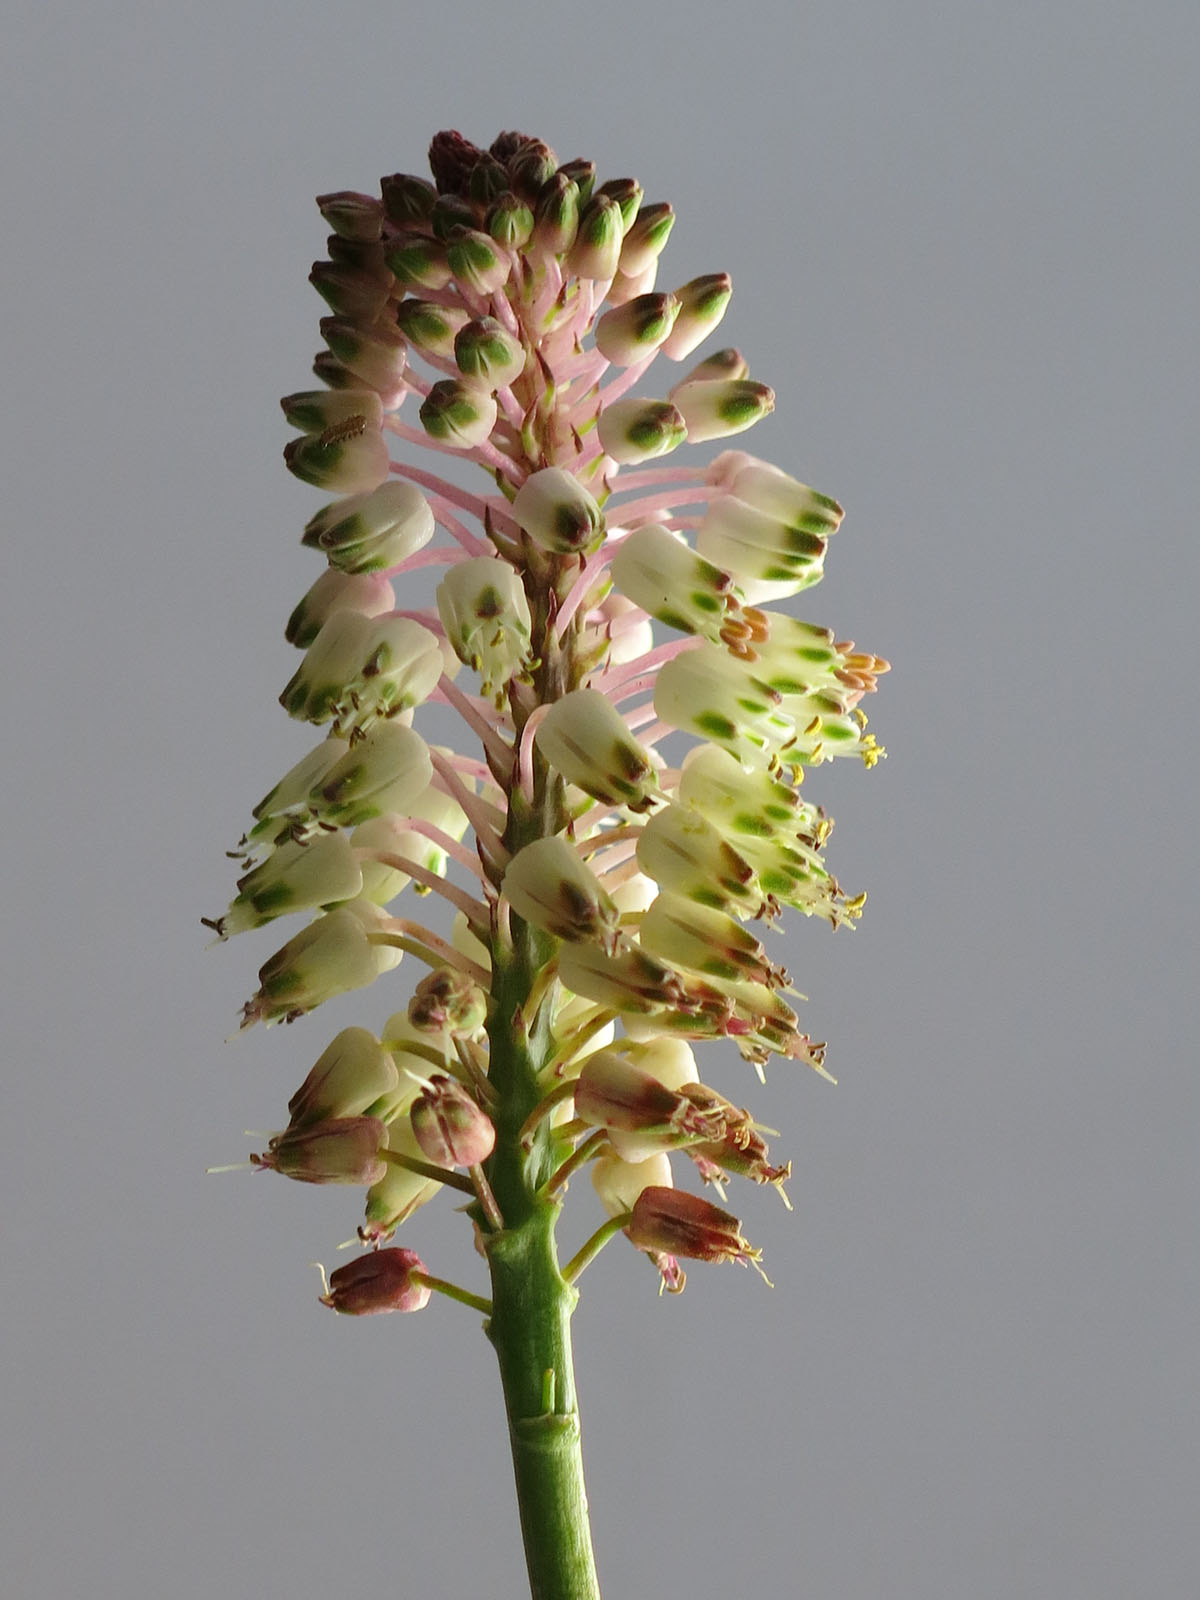 Lachenalia montana 3